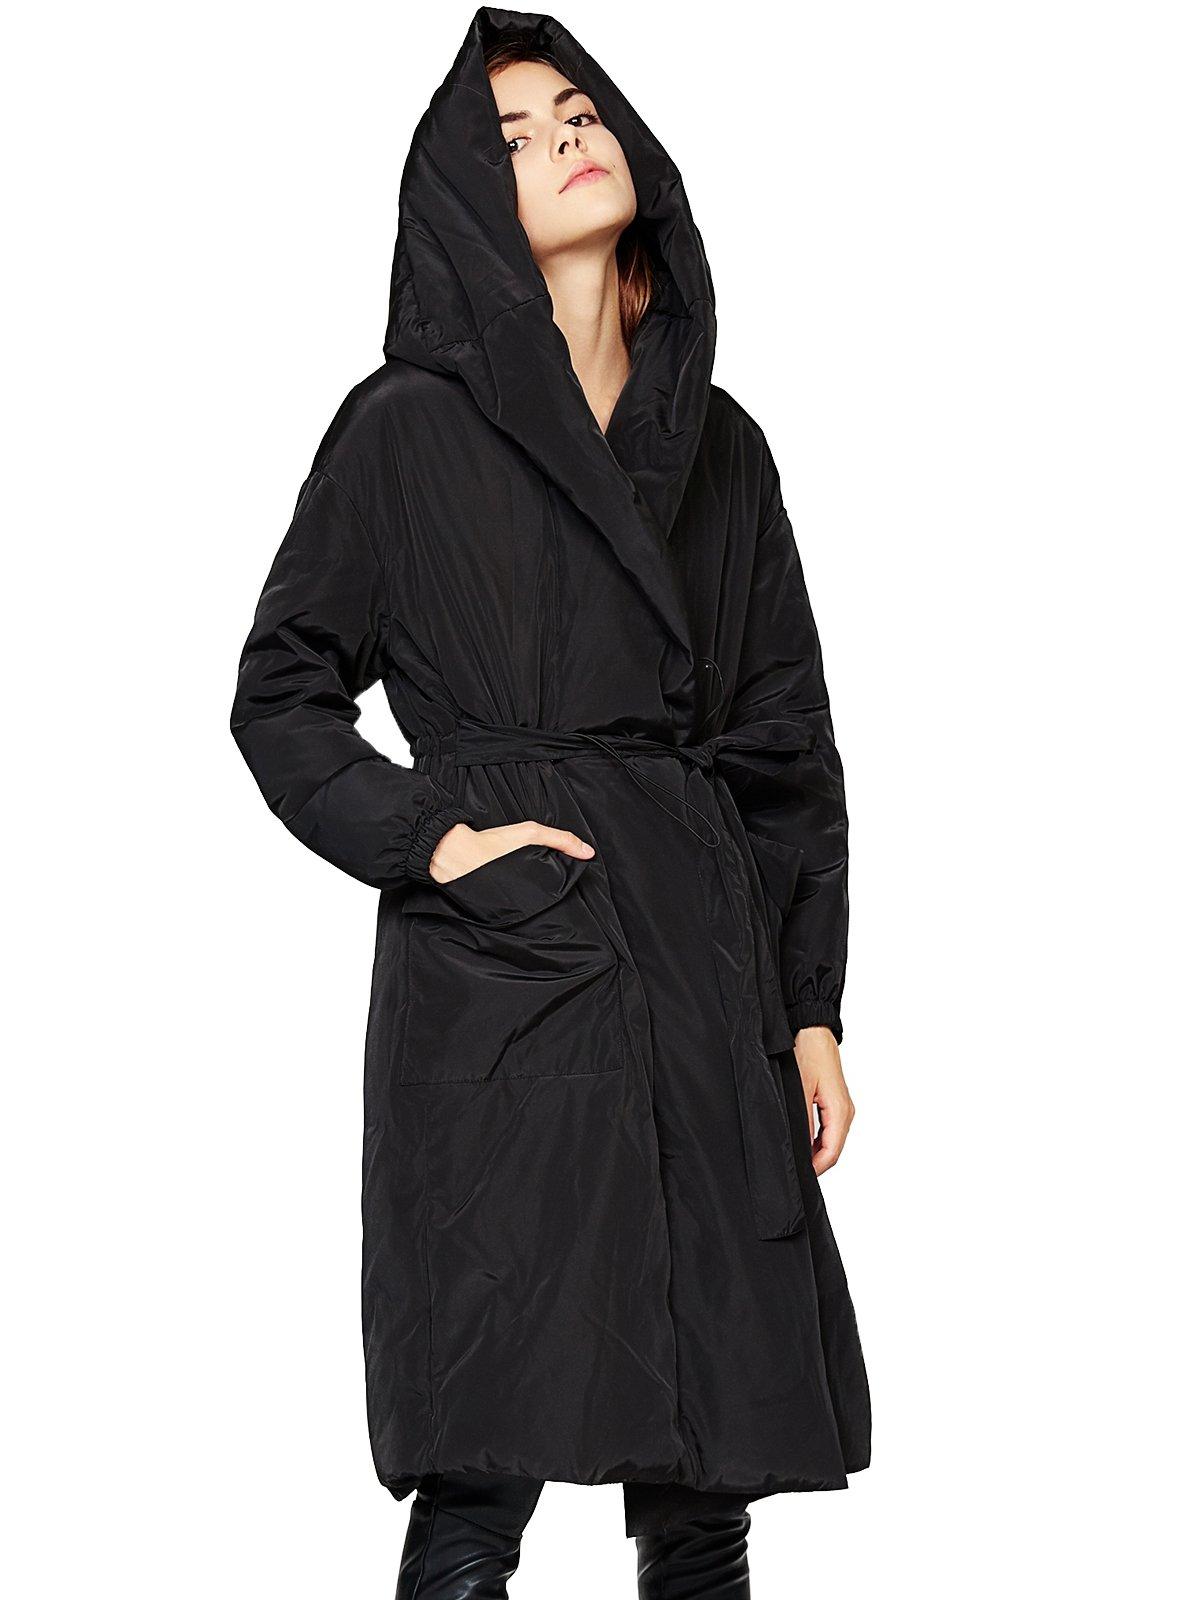 ANNA&CHRIS Womens Long Light Down Jacket Open Front Coat With Belt Hooded Parka 2XL